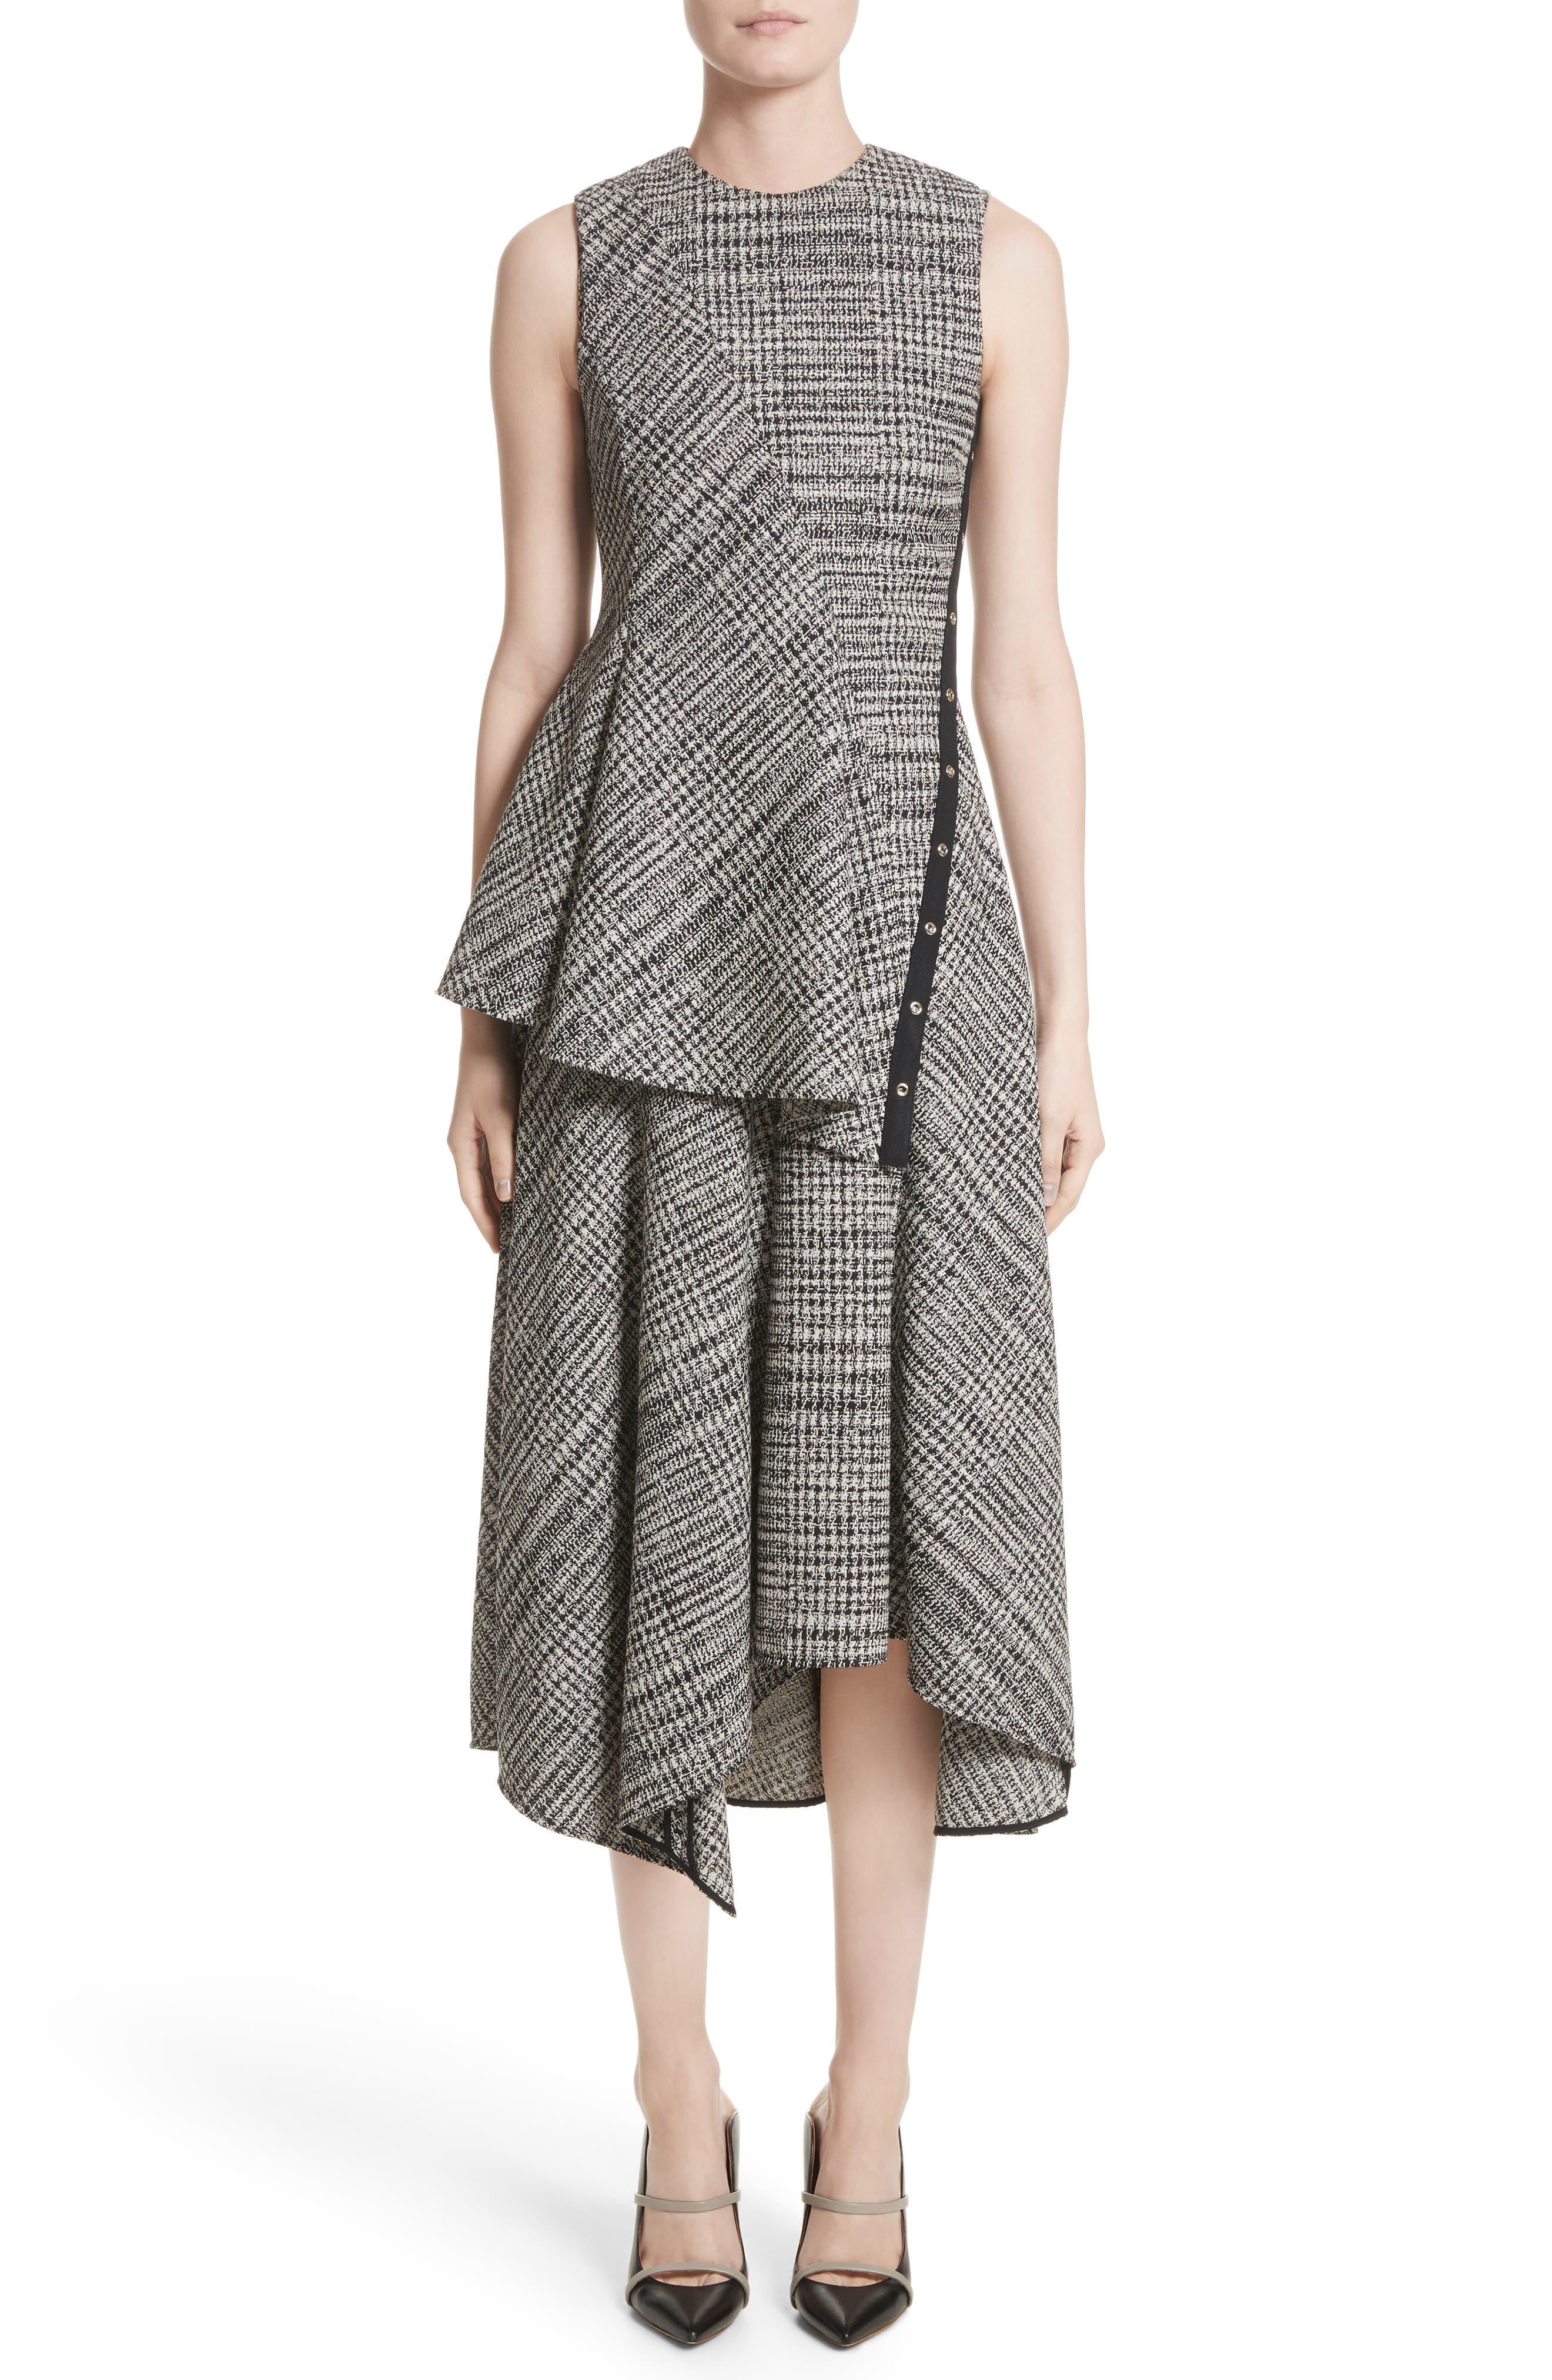 JASON WU COLLECTION,                             Jason Wu Check Wool Fit & Flare Dress,                             Alternate thumbnail 6, color,                             001